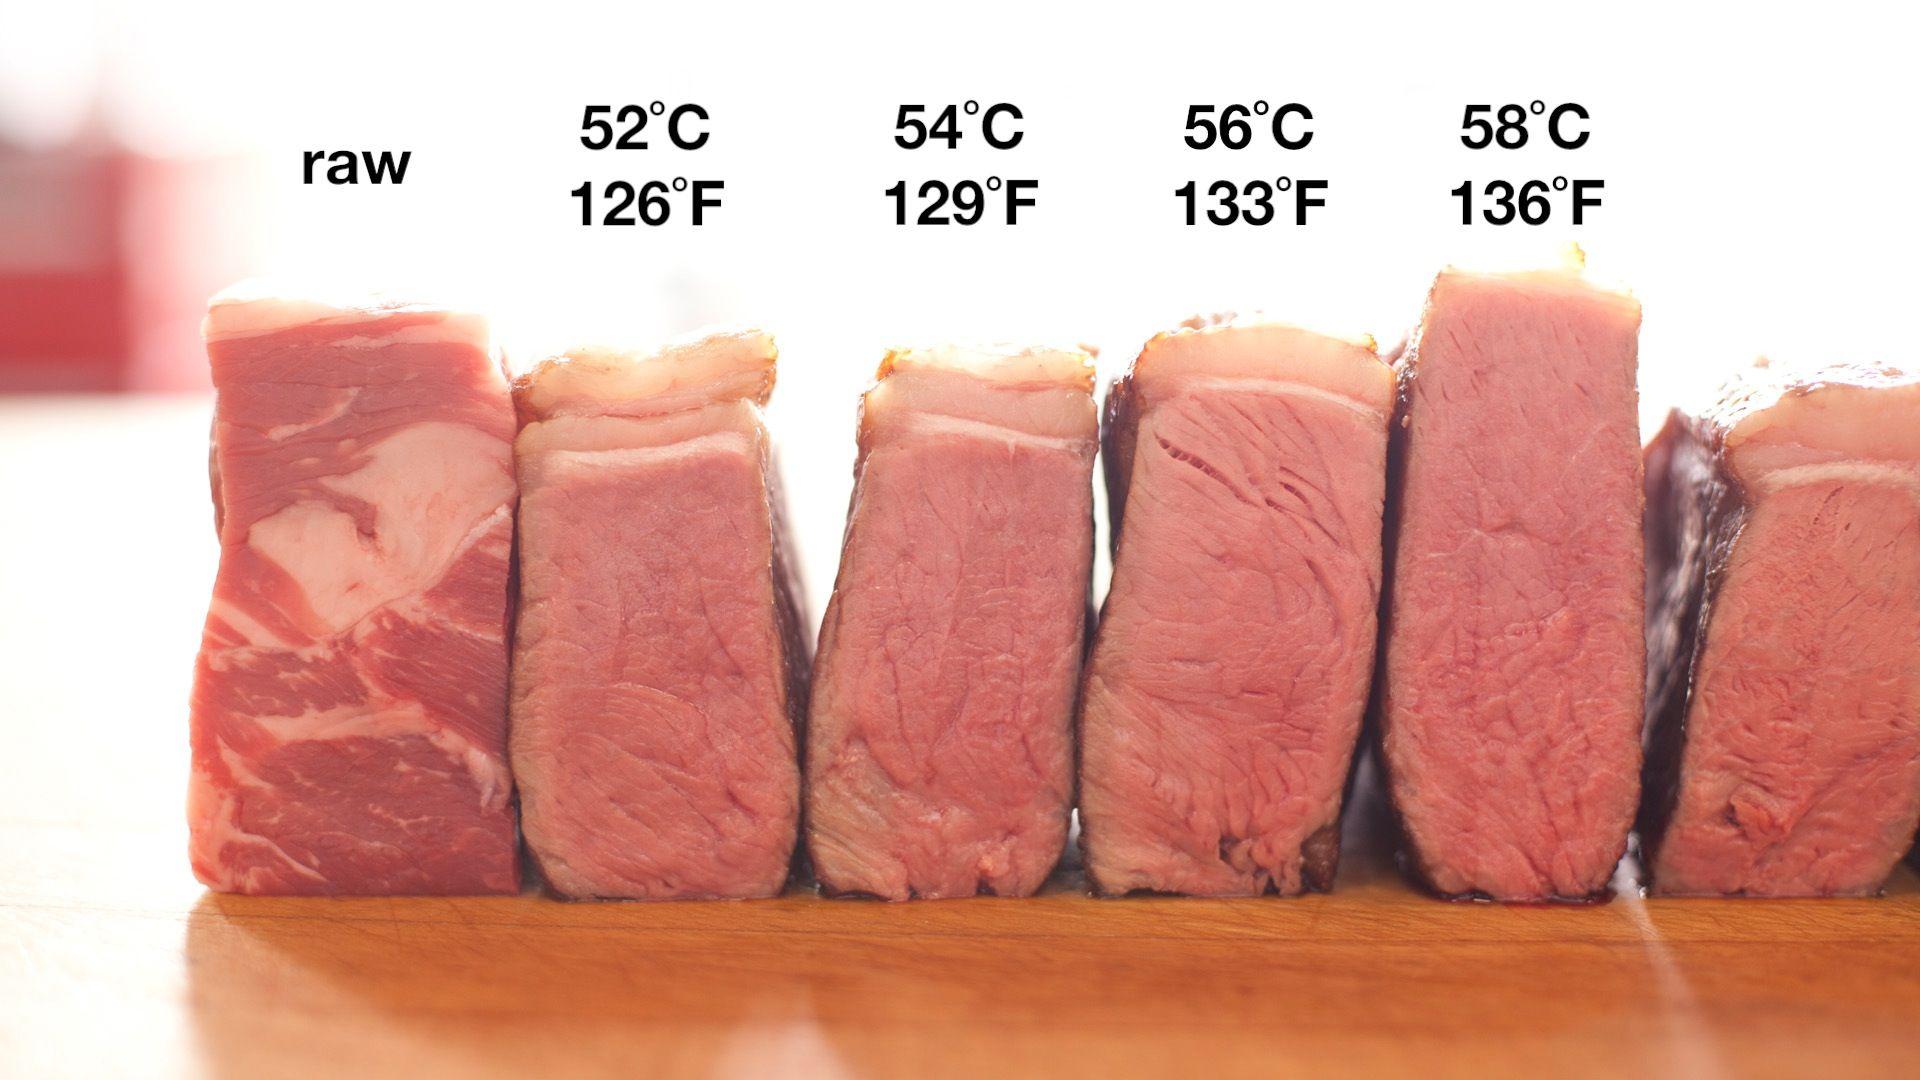 Sous Vide Steak Sous Vide Recipe Recipe Sous Vide Steak Sous Vide Steak Recipe Sous Vide Recipes